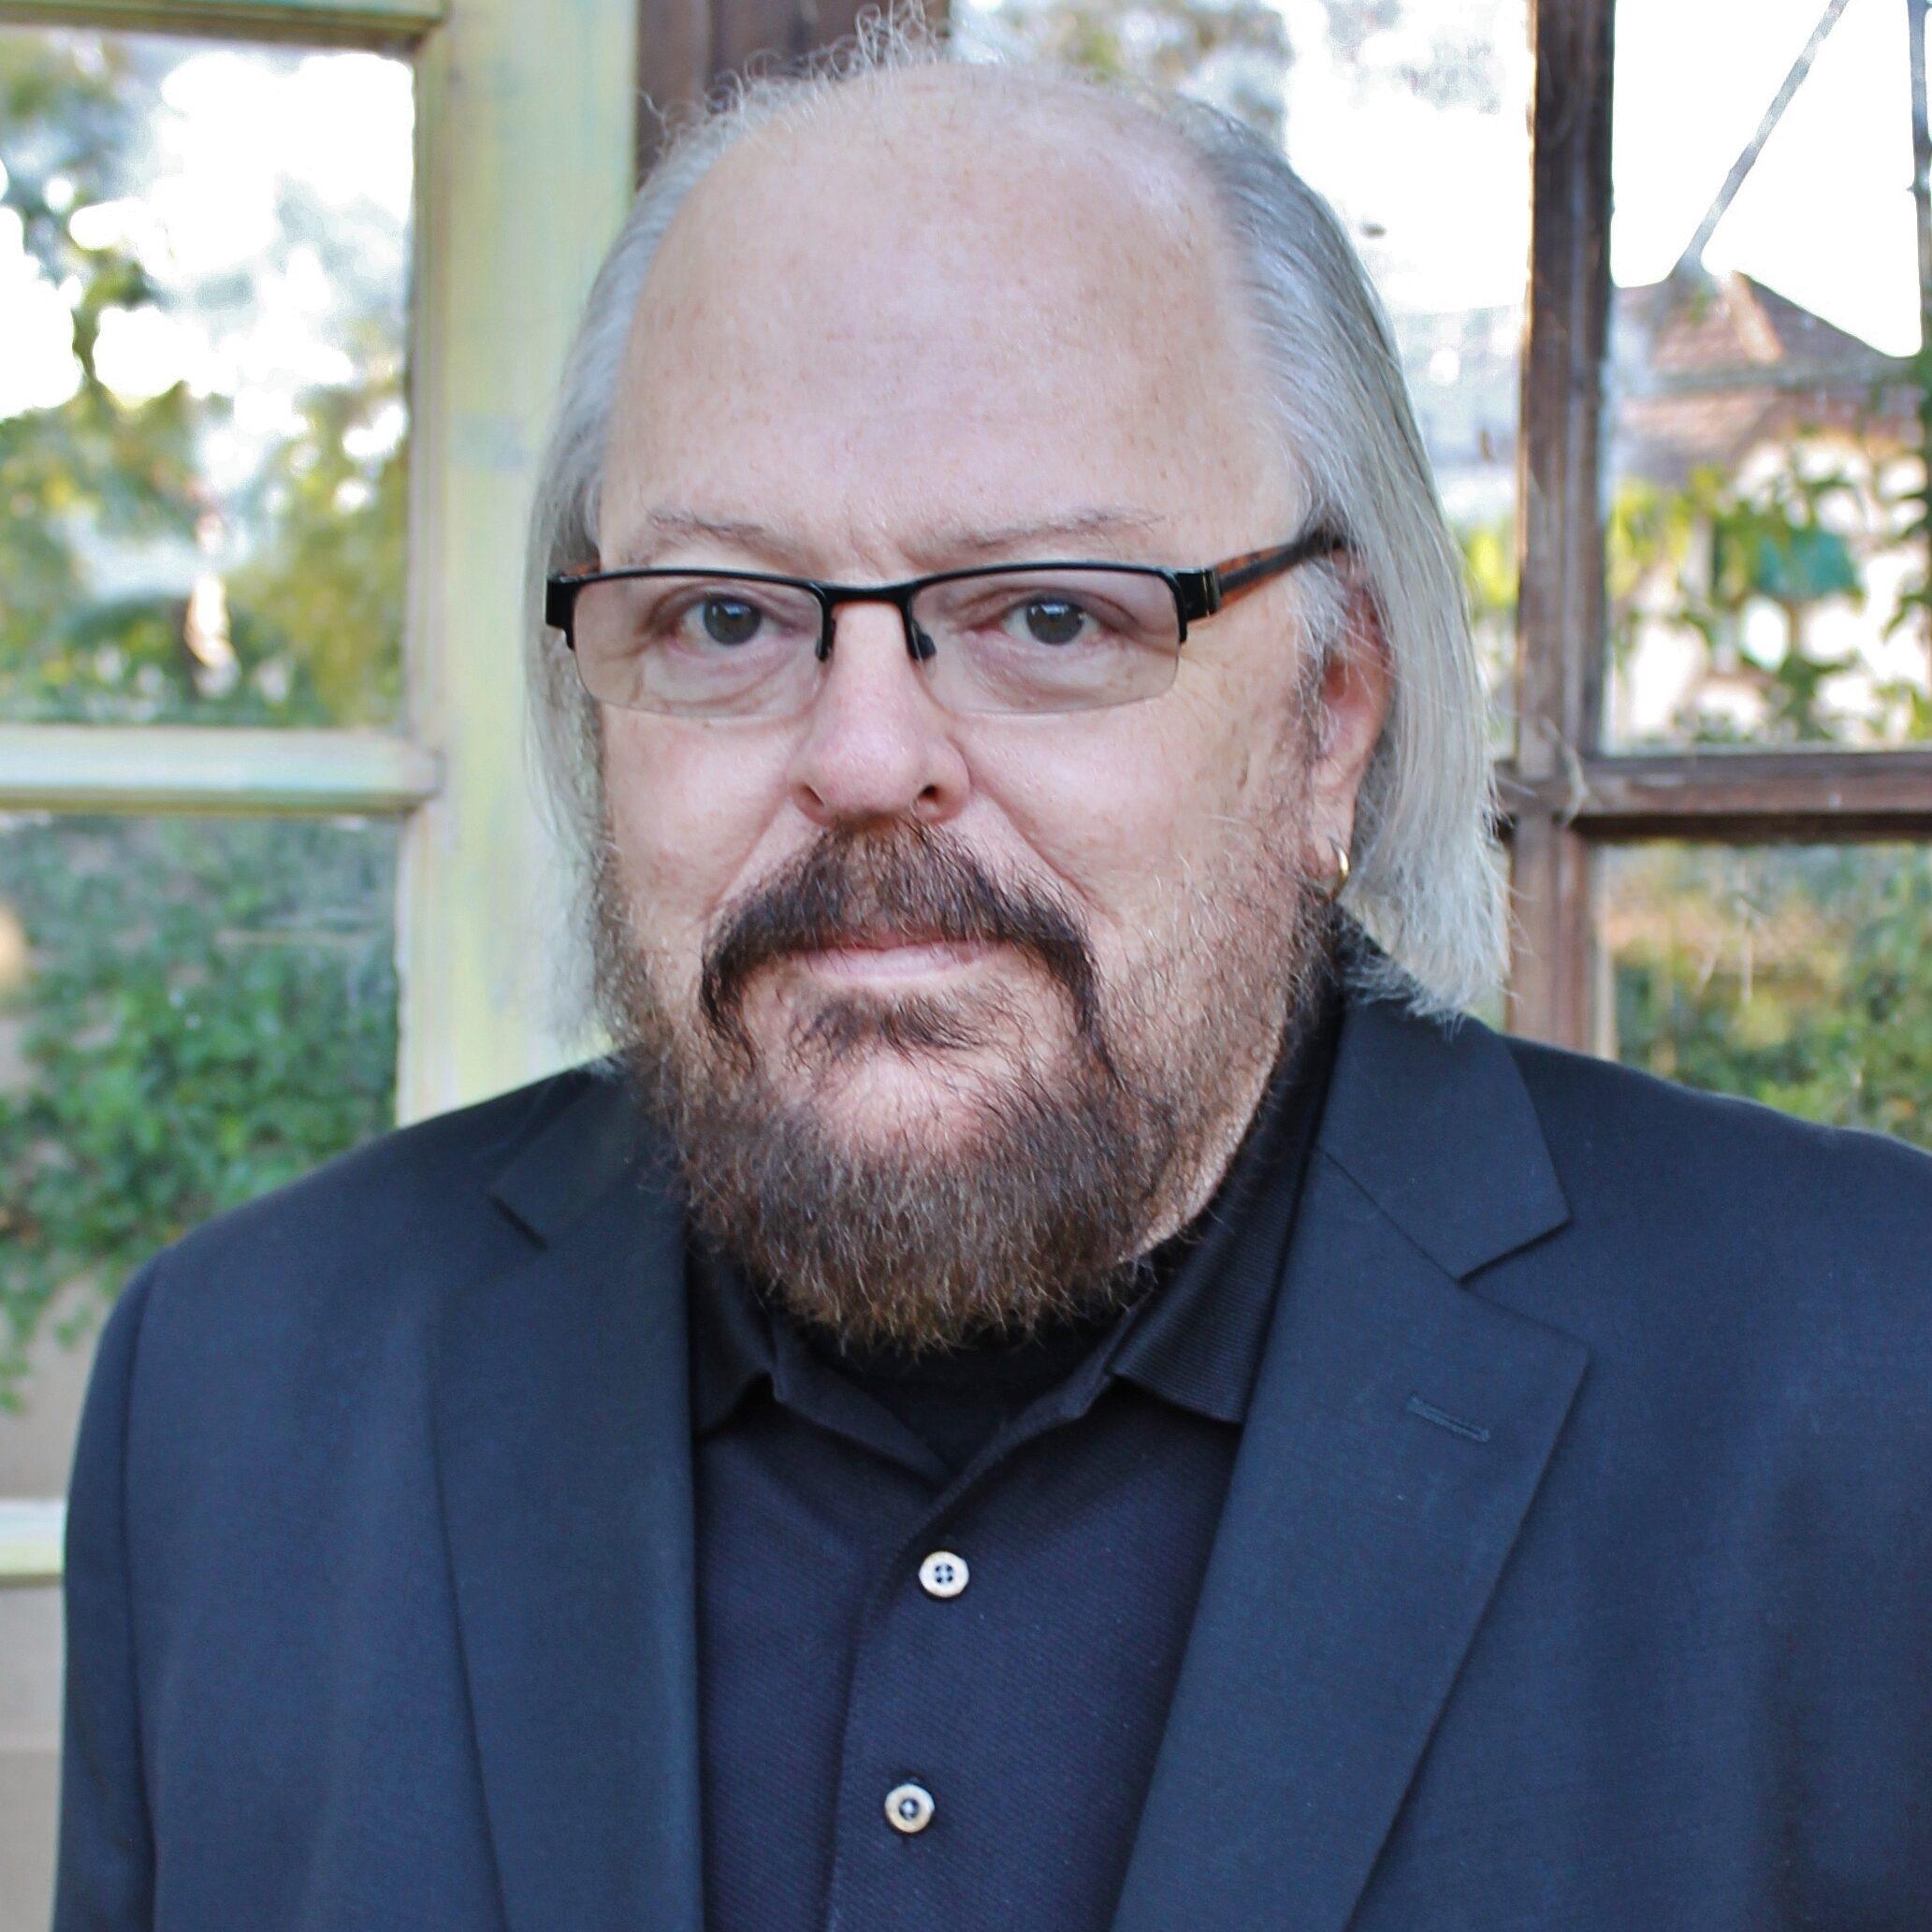 Bob Altizer